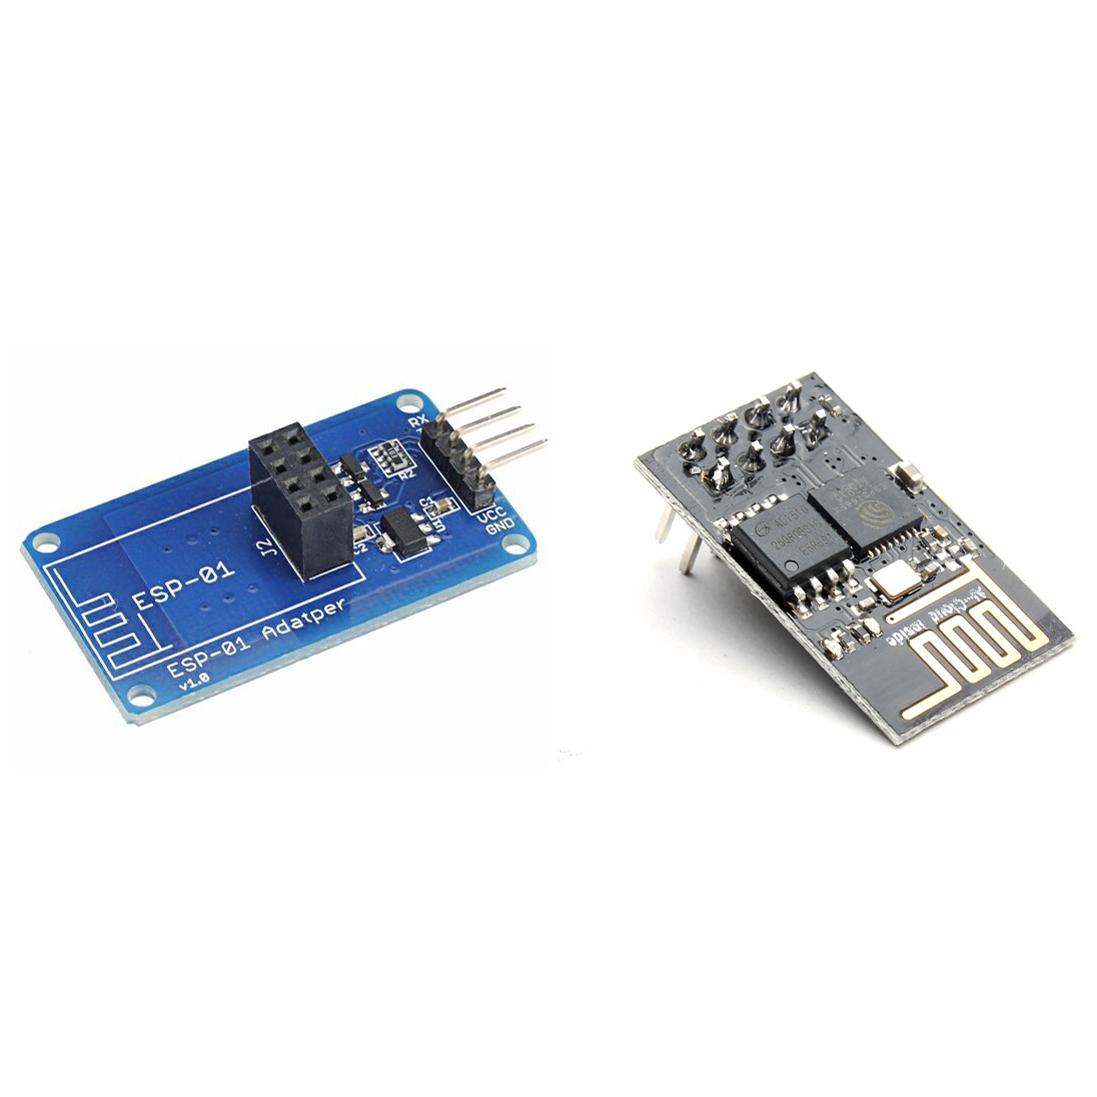 Esp wifi transceiver wireless module serial